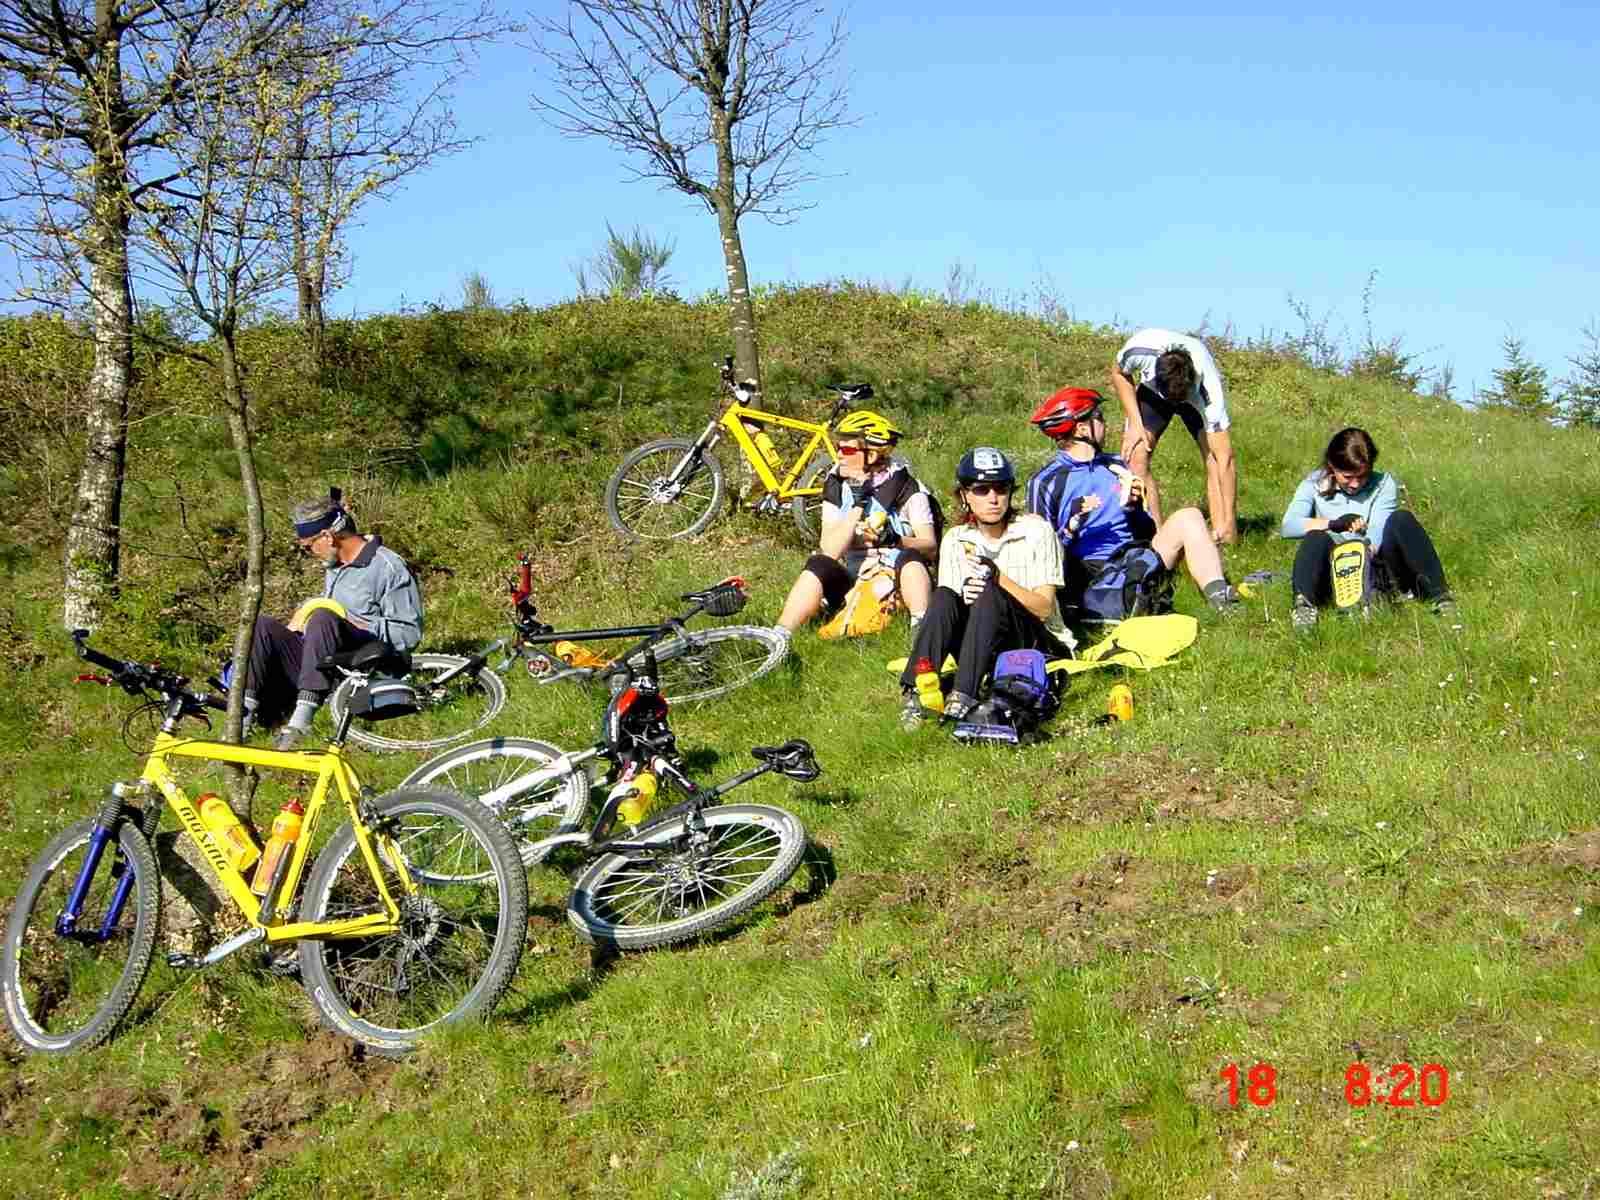 Foto: Manfred Karl / Mountainbike Tour / Monte Ginezzo, 928 m / Erste Gipfelrast / 20.06.2007 06:21:46